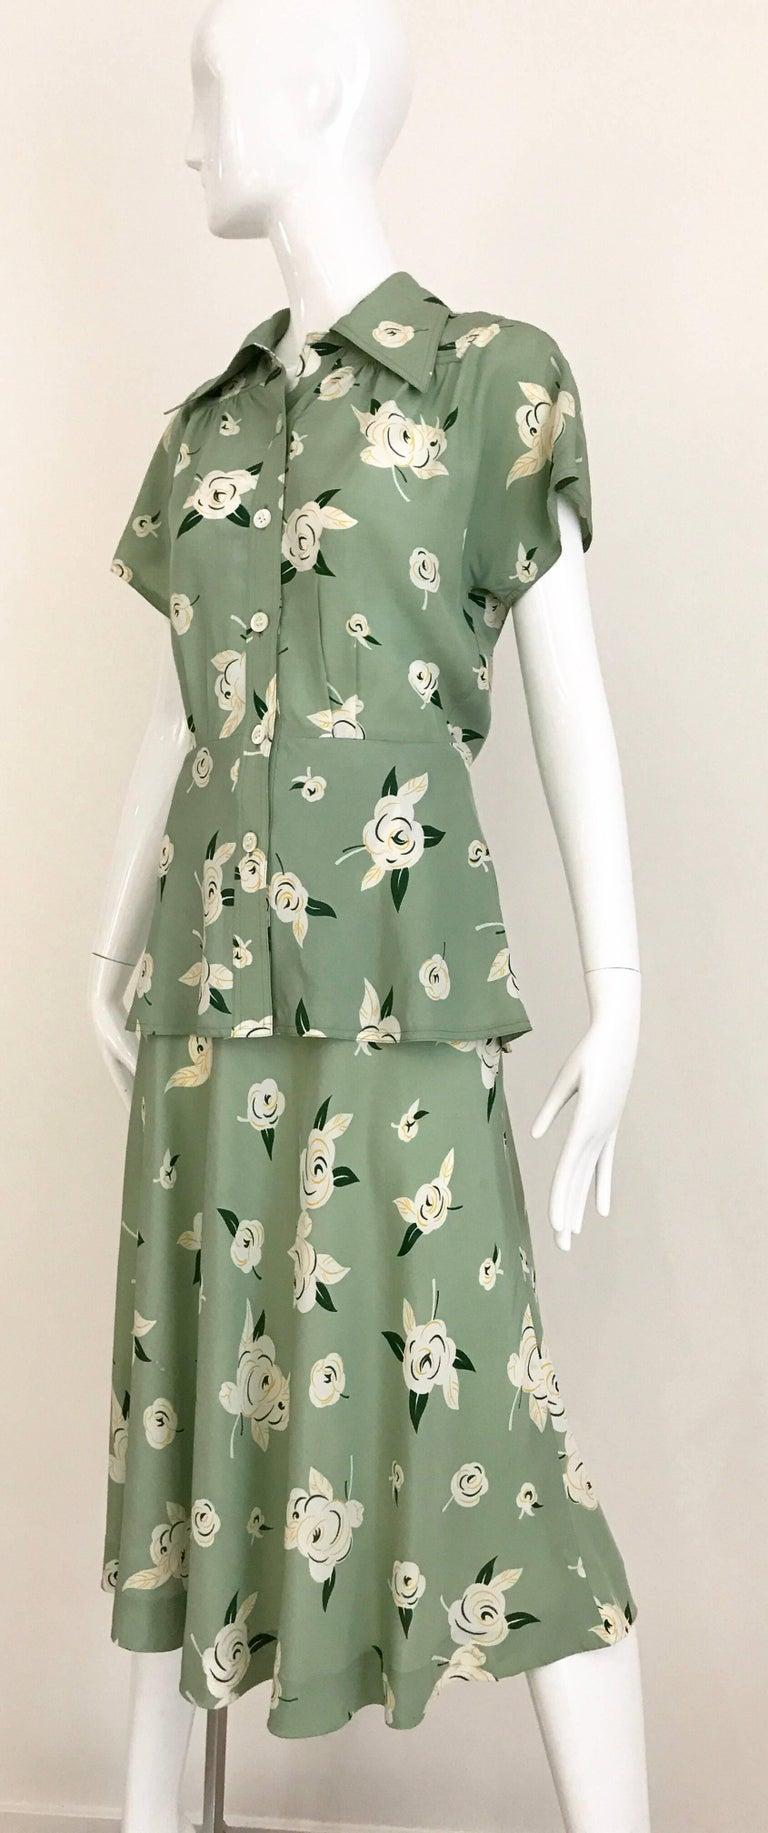 Women's GUY LAROCHE 1970s Floral Print Light Green Rayon Blouse Skirt Ensemble  For Sale